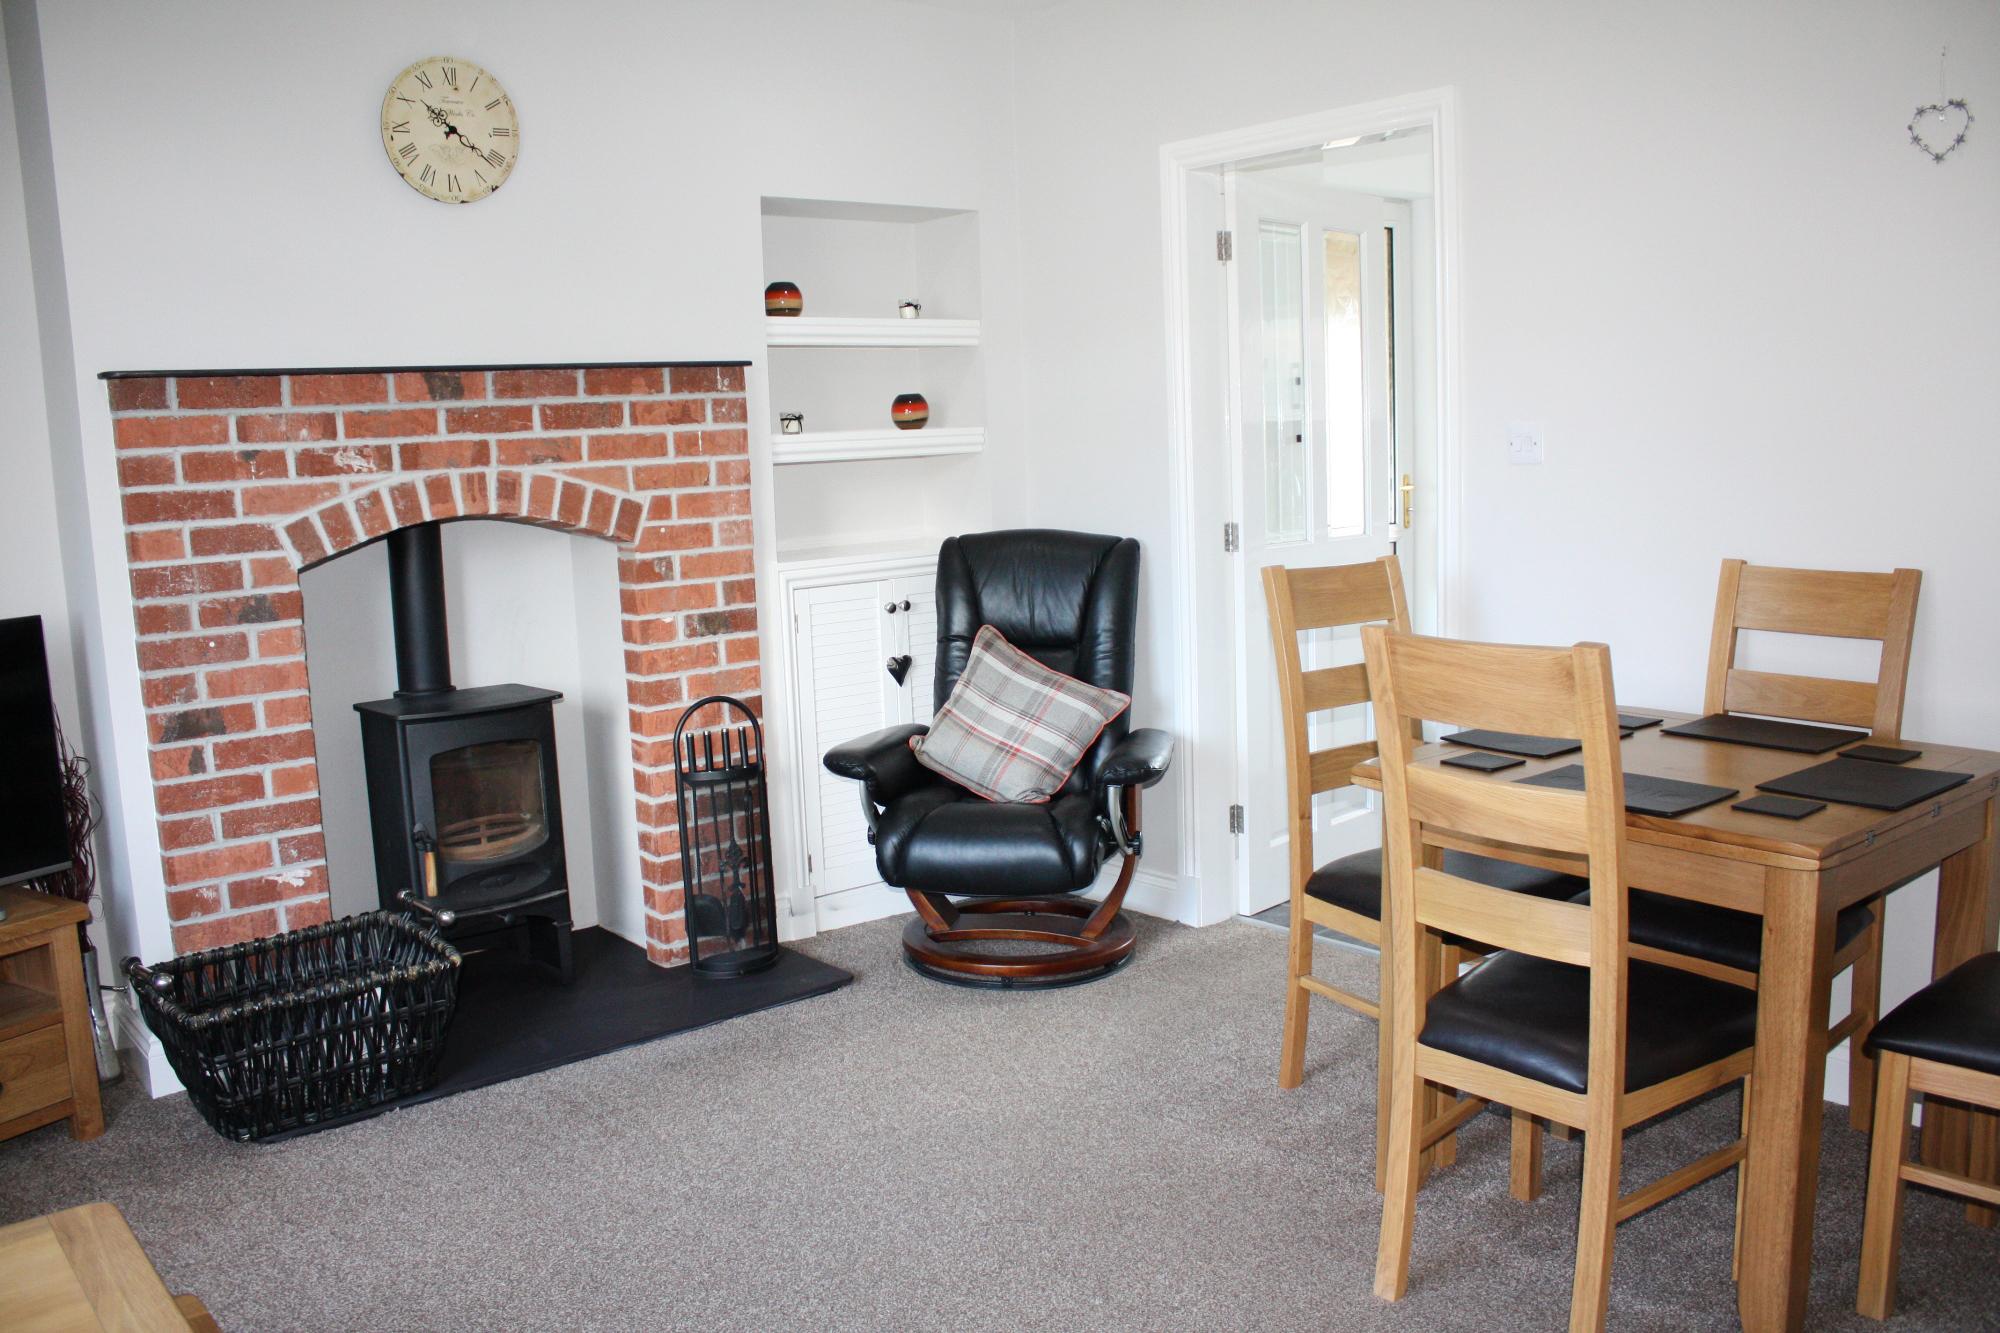 ferienhaus coolin in isle of skye grossbritannien. Black Bedroom Furniture Sets. Home Design Ideas